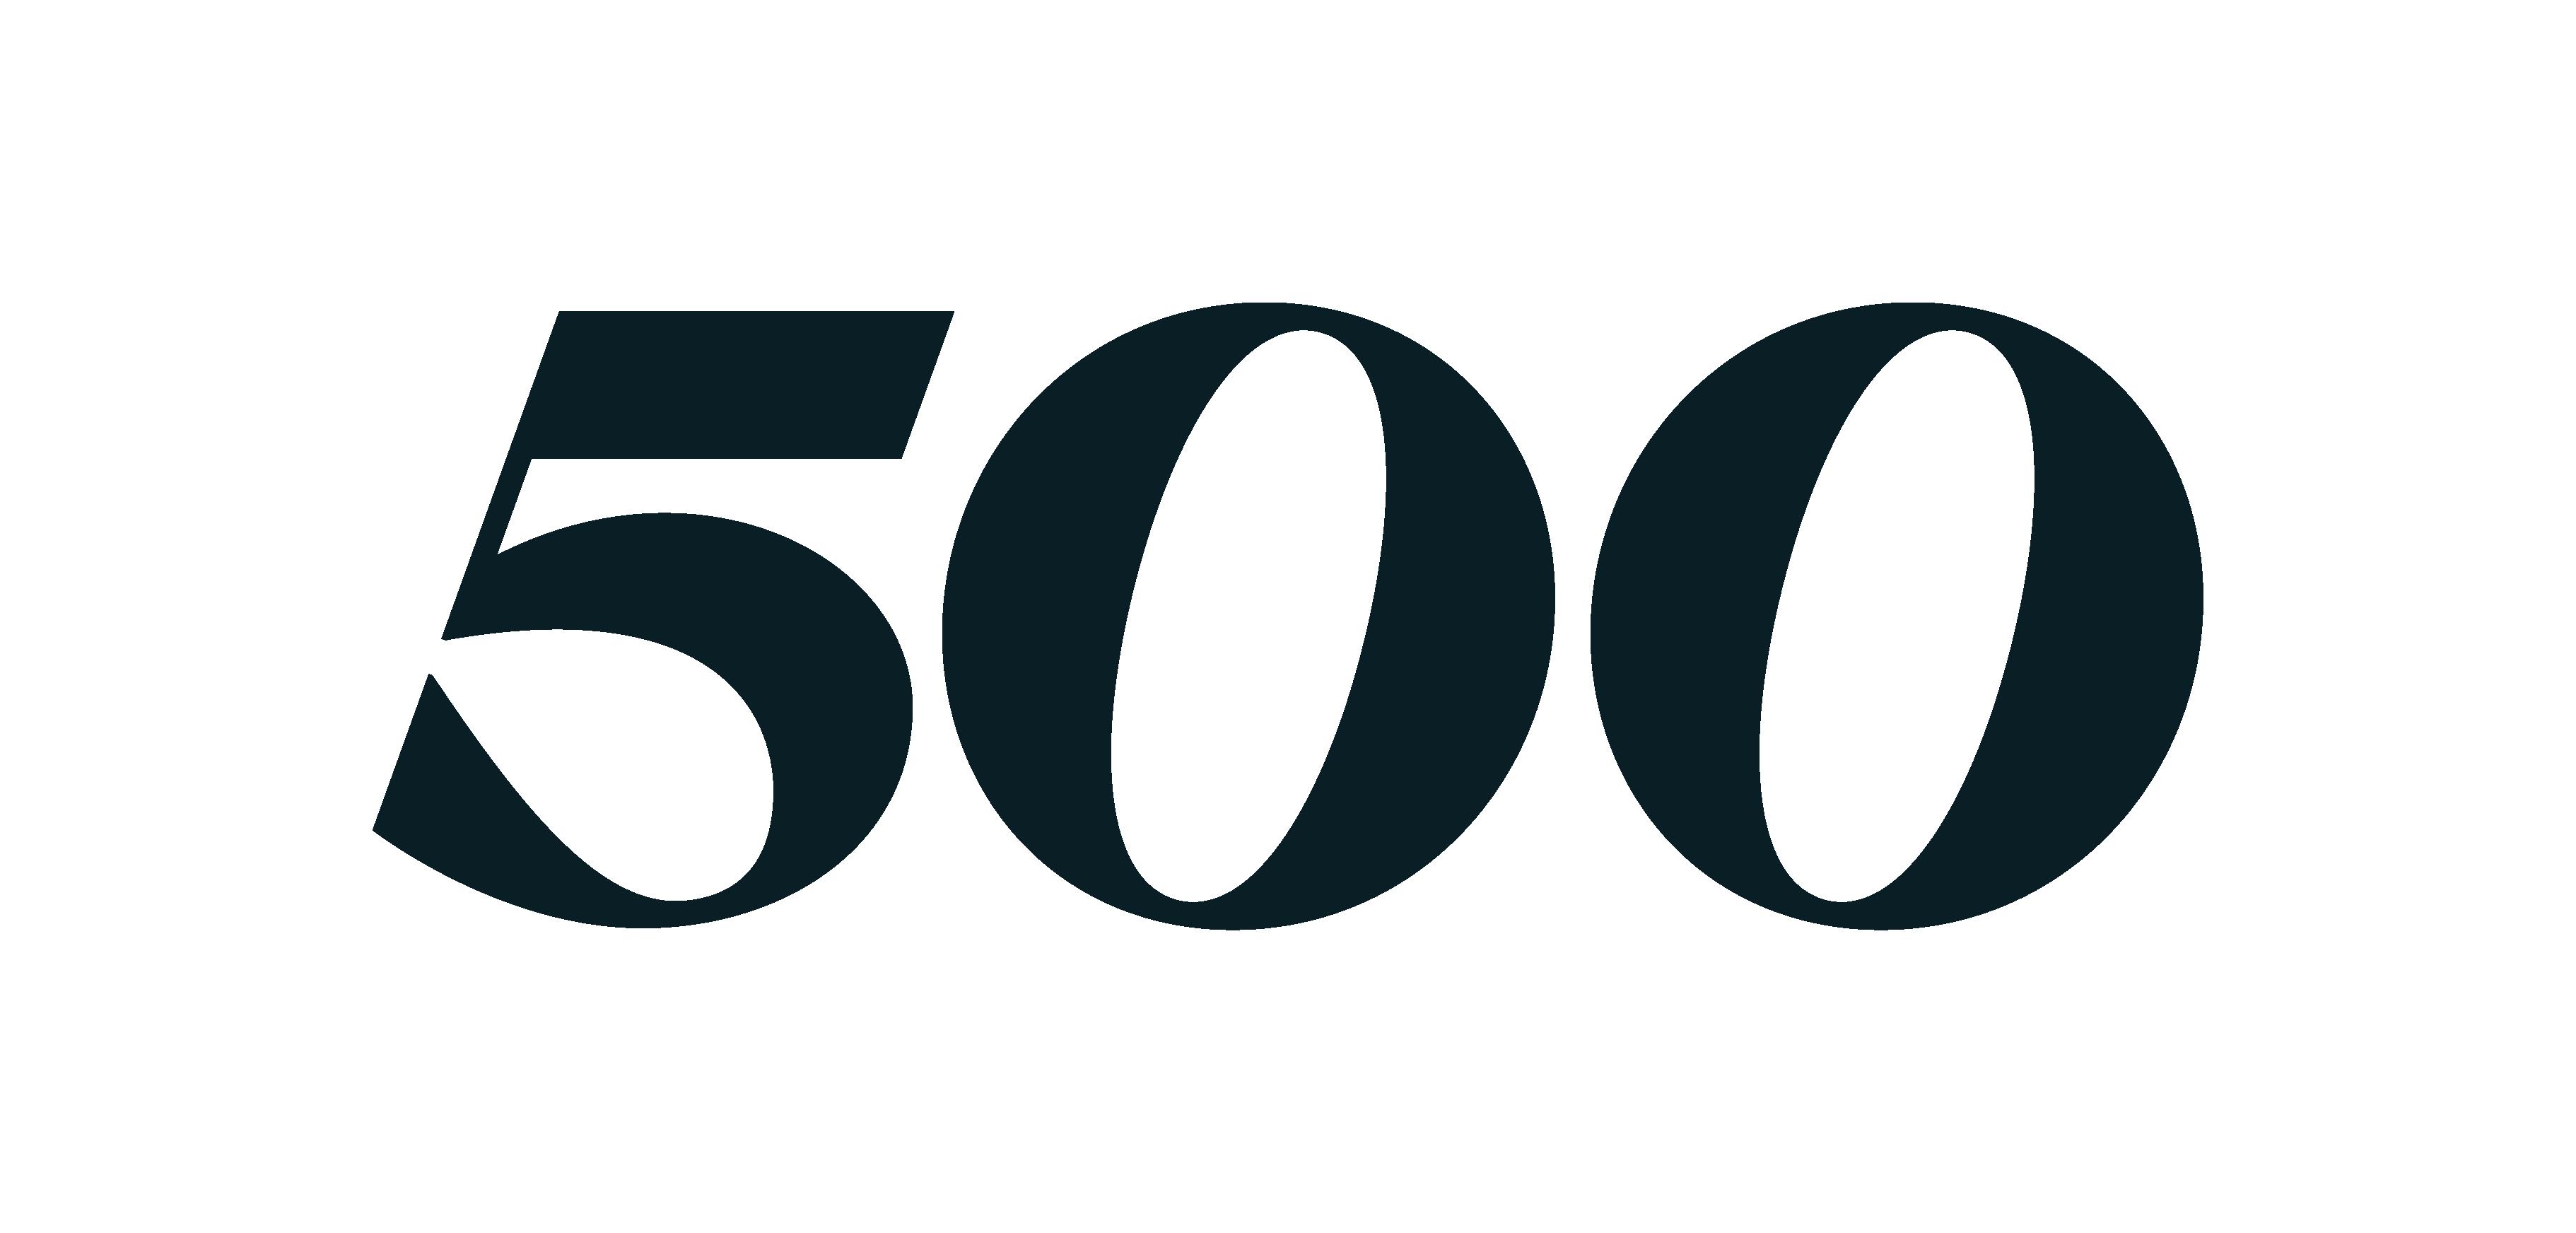 500 Southeast Asia is hiring on Meet.jobs!